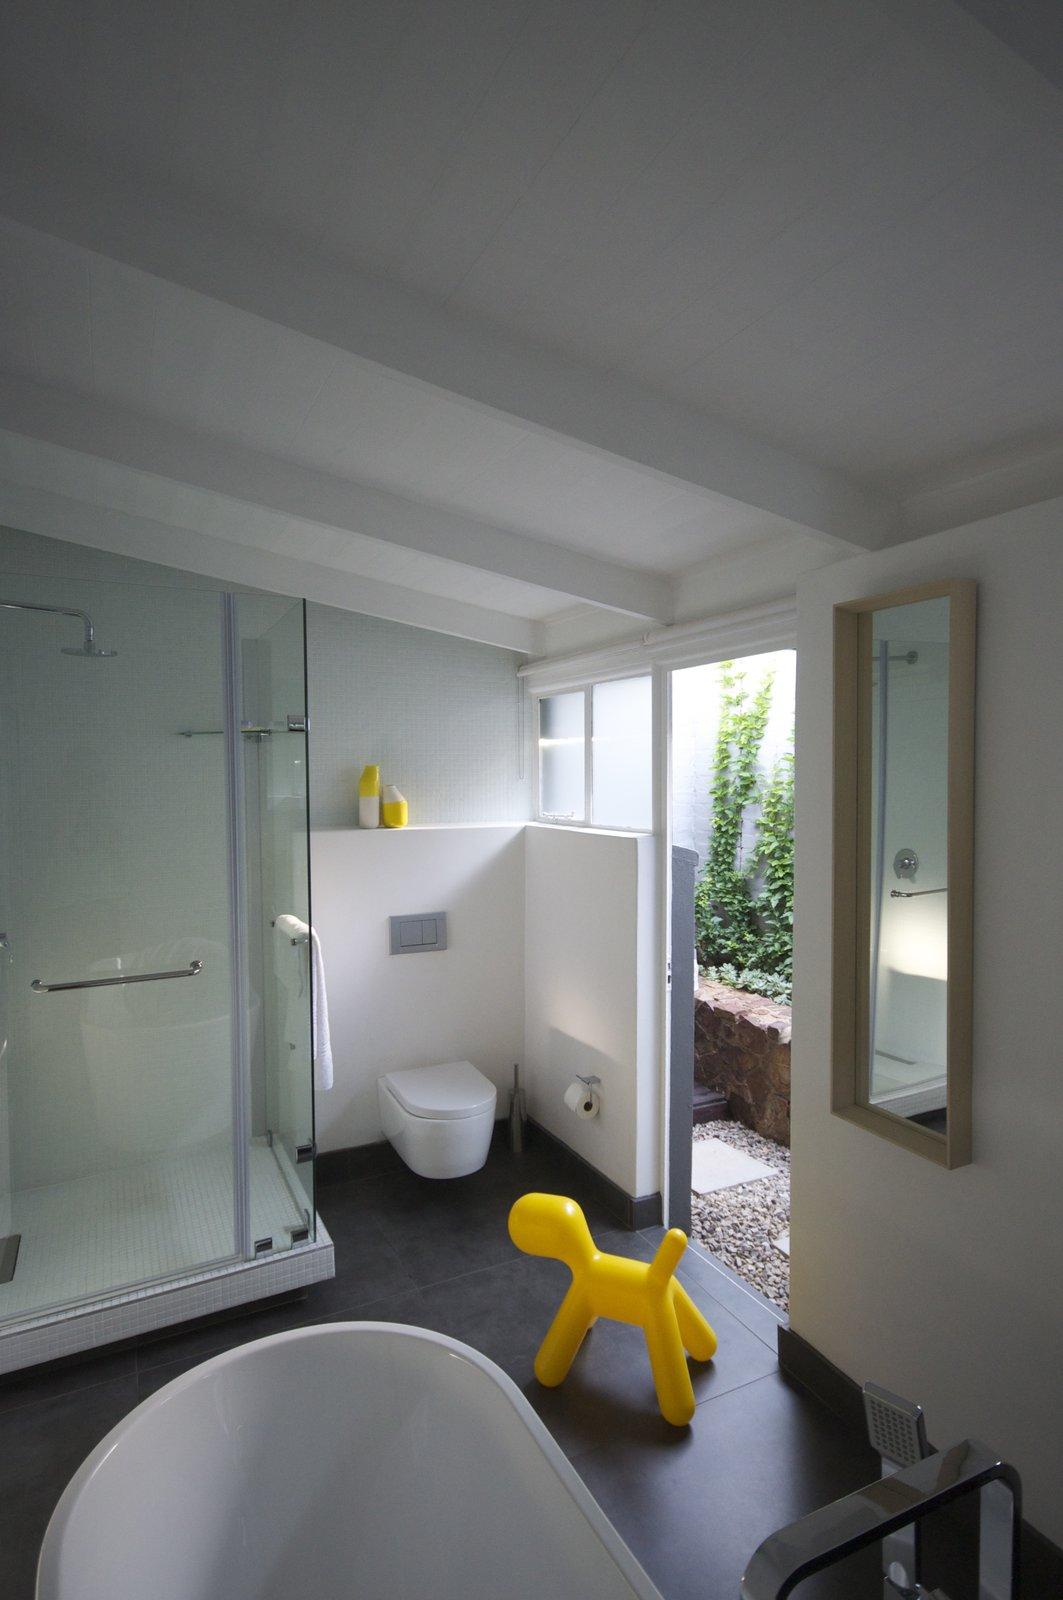 Bath Room, Freestanding Tub, Corner Shower, Mosaic Tile Wall, Enclosed Shower, One Piece Toilet, and Ceramic Tile Floor bathroom  Grey House